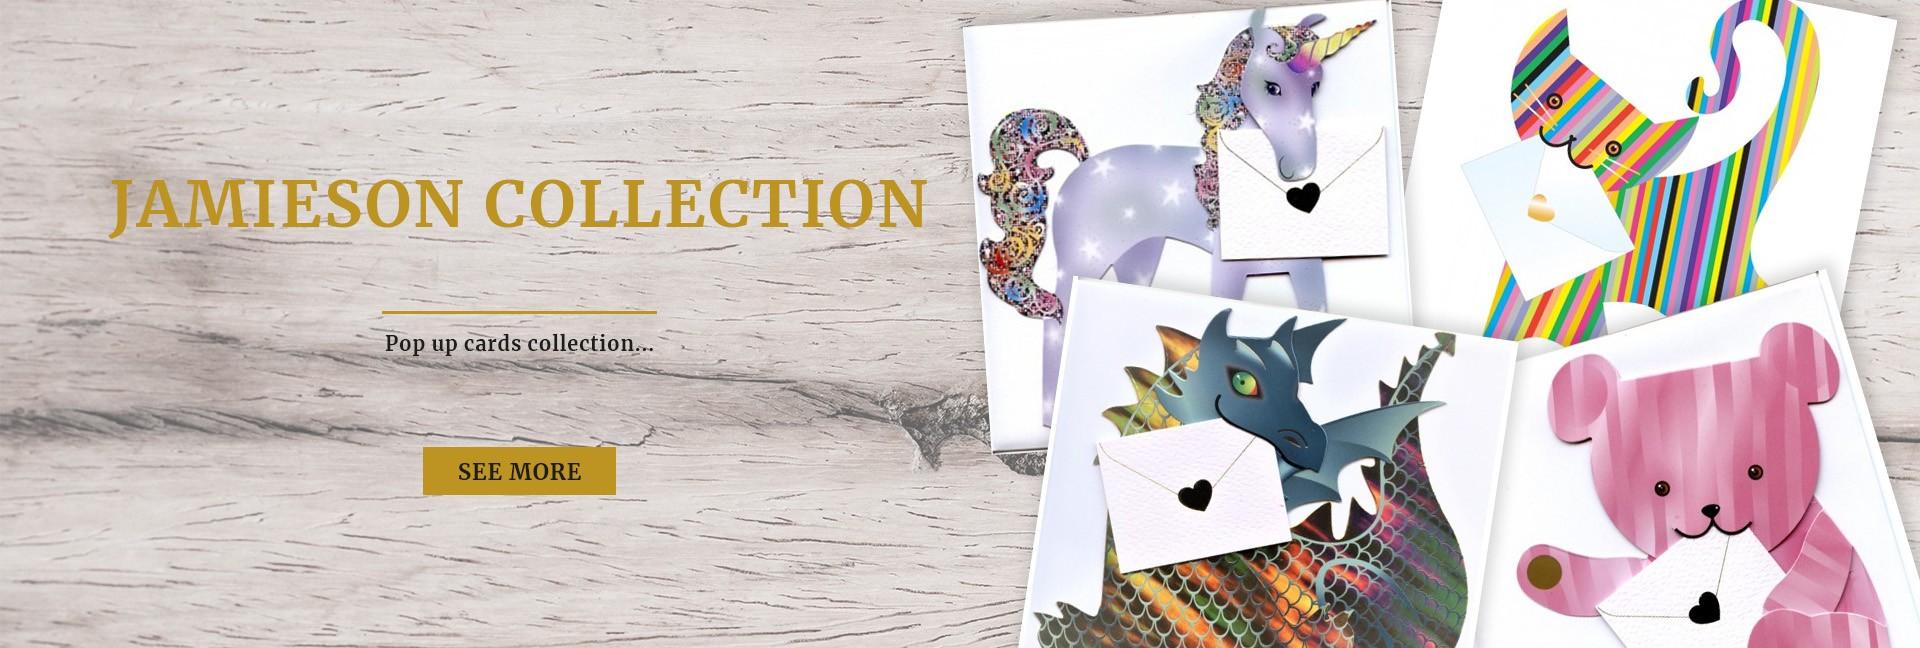 Jamieson Collection